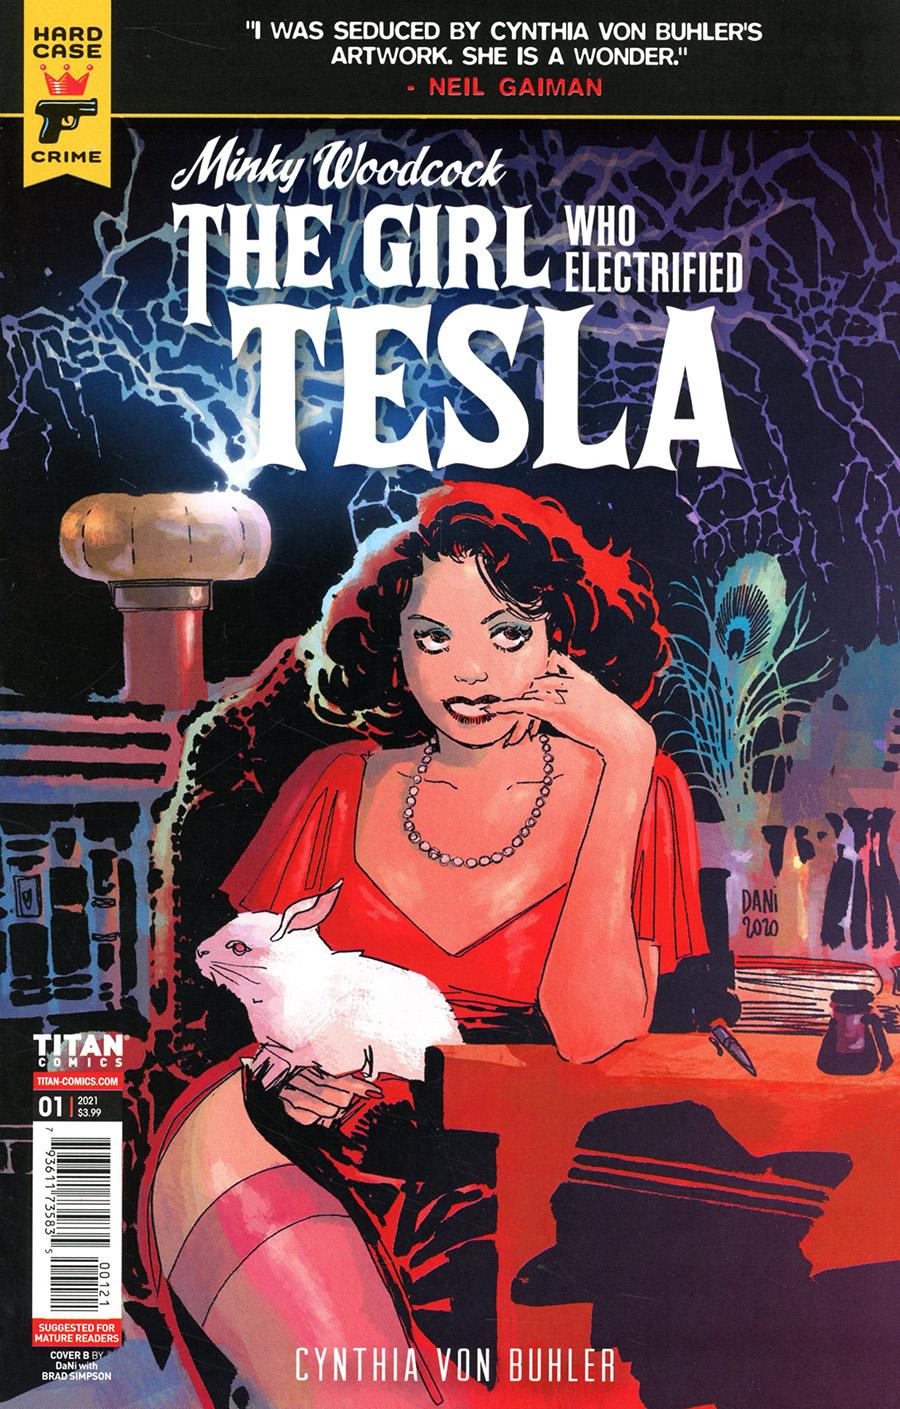 Hard Case Crime Minky Woodcock Girl Who Electrified Tesla #1 Cover B Variant Dani Strips Cover